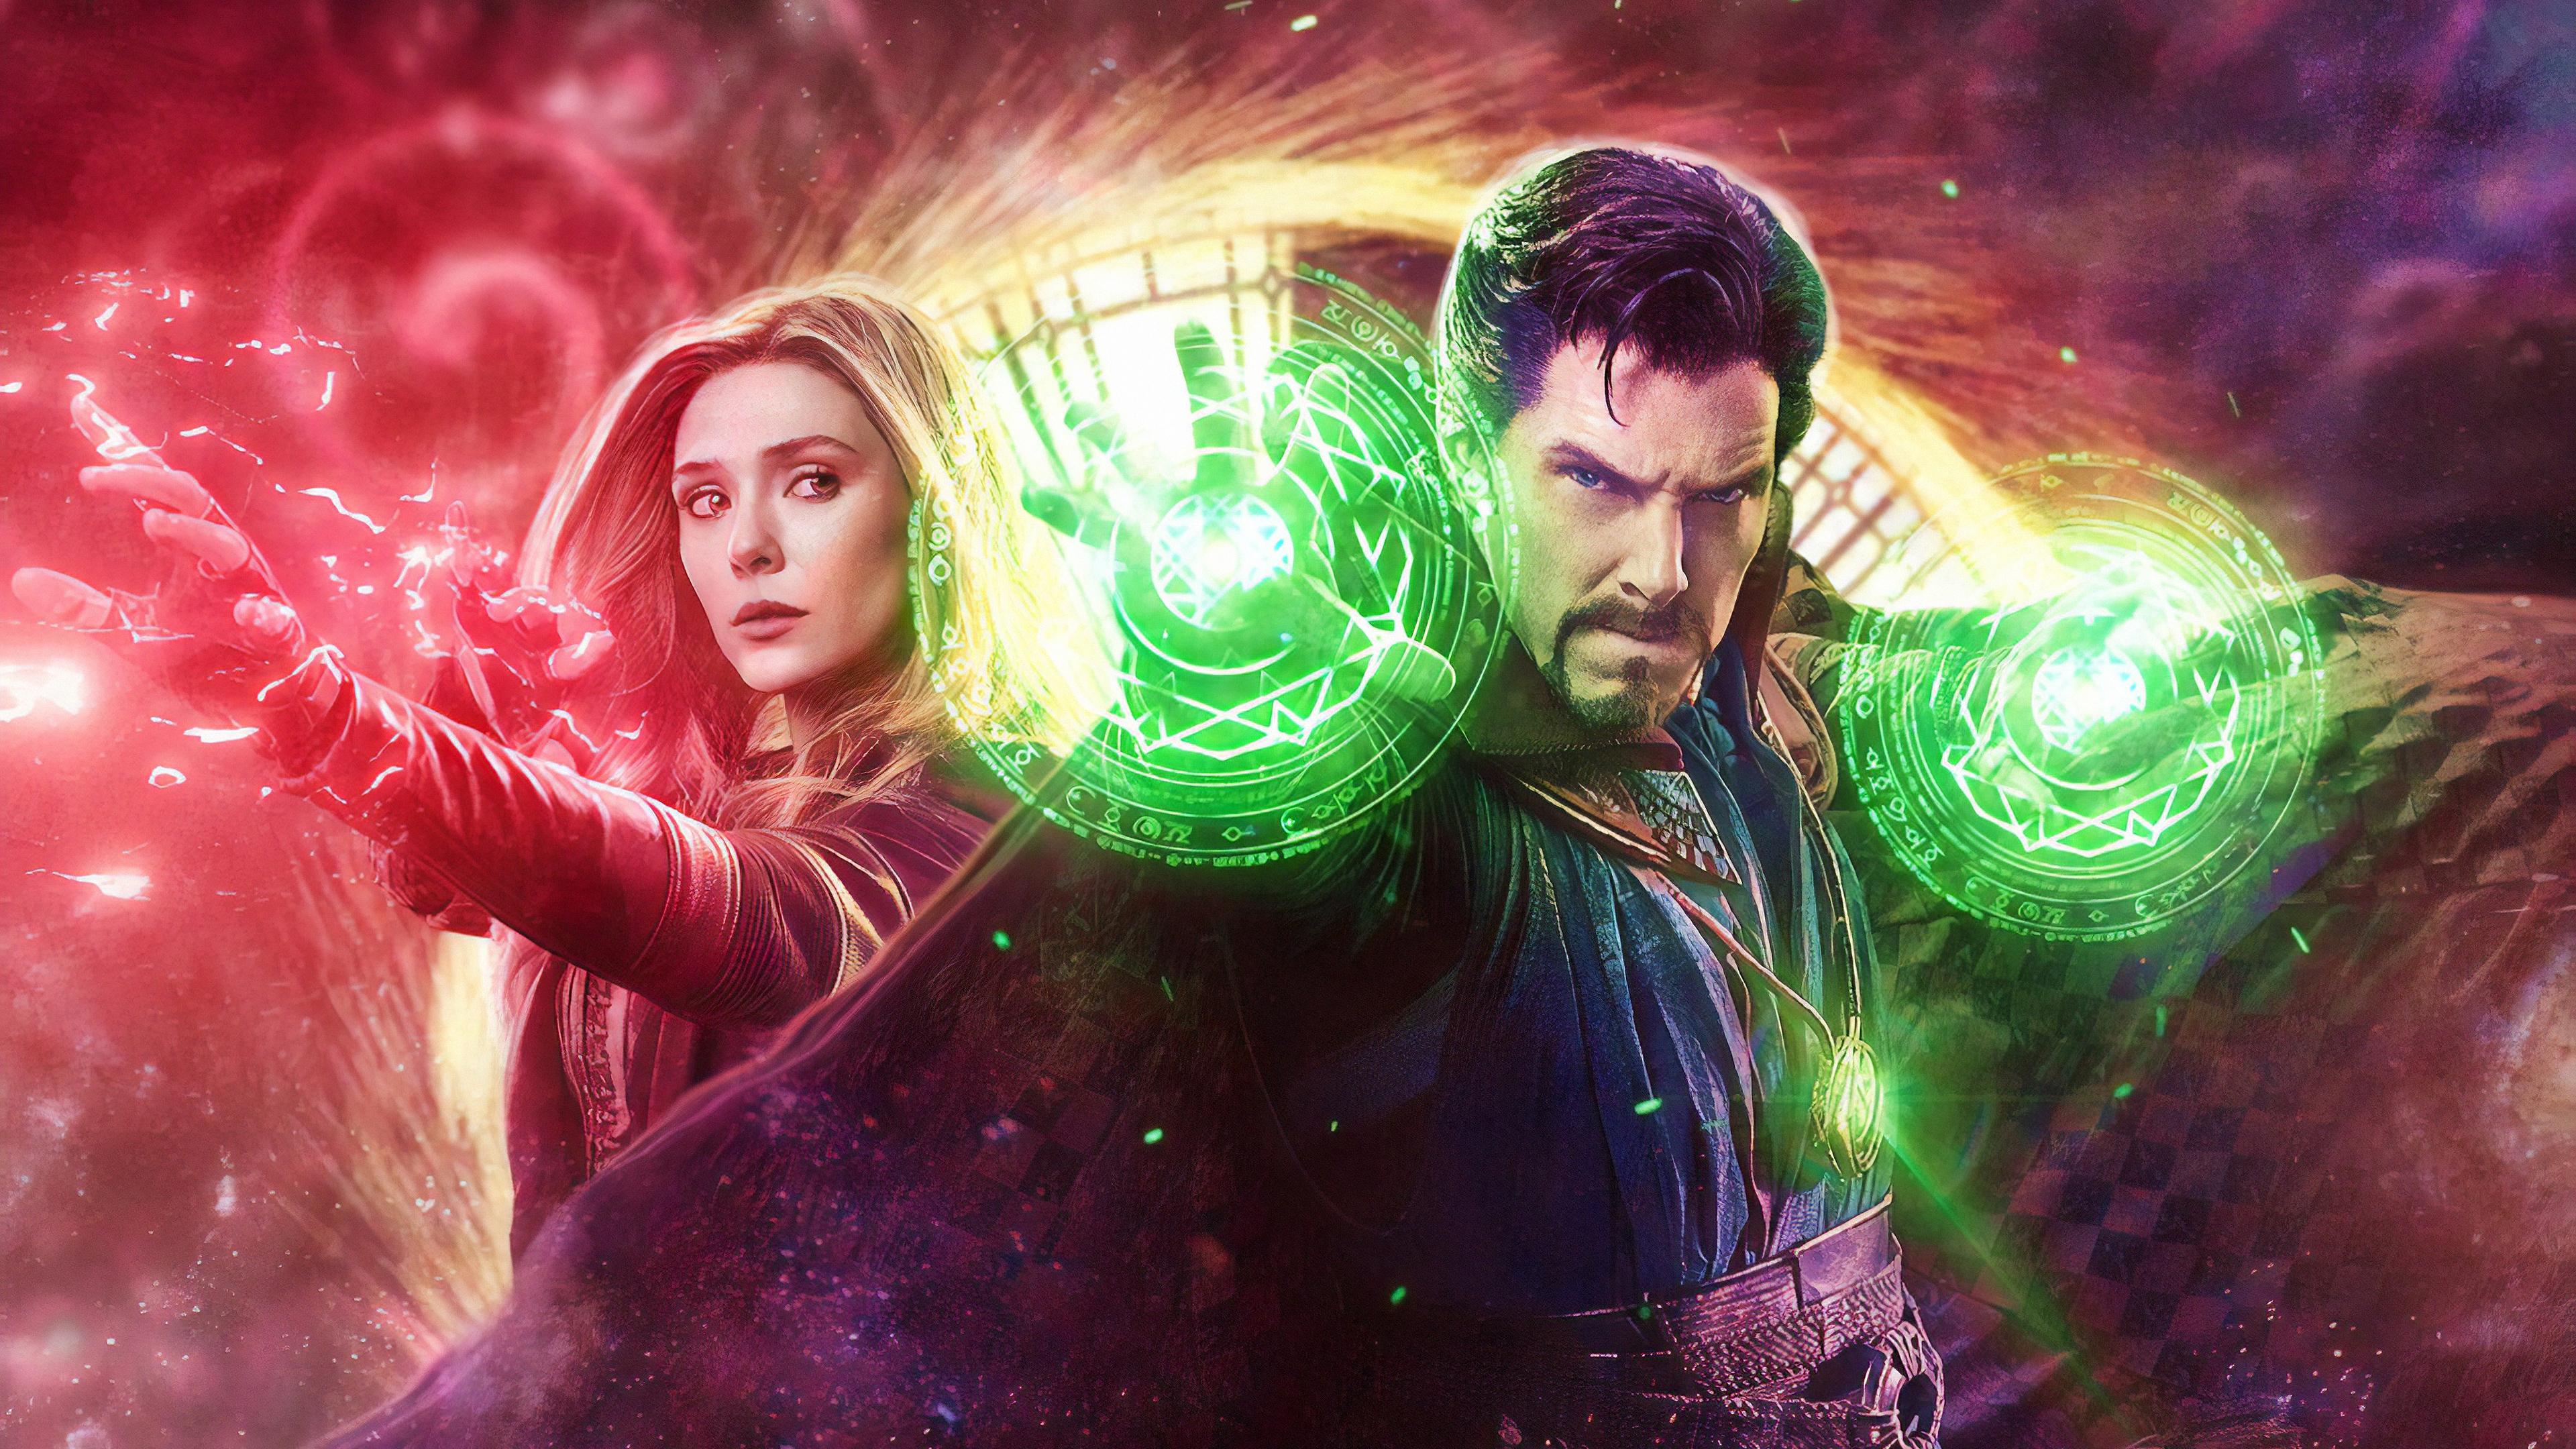 Wallpaper 4k Doctor Strange In The Multiverse Of Madness Wallpaper 3840x2160